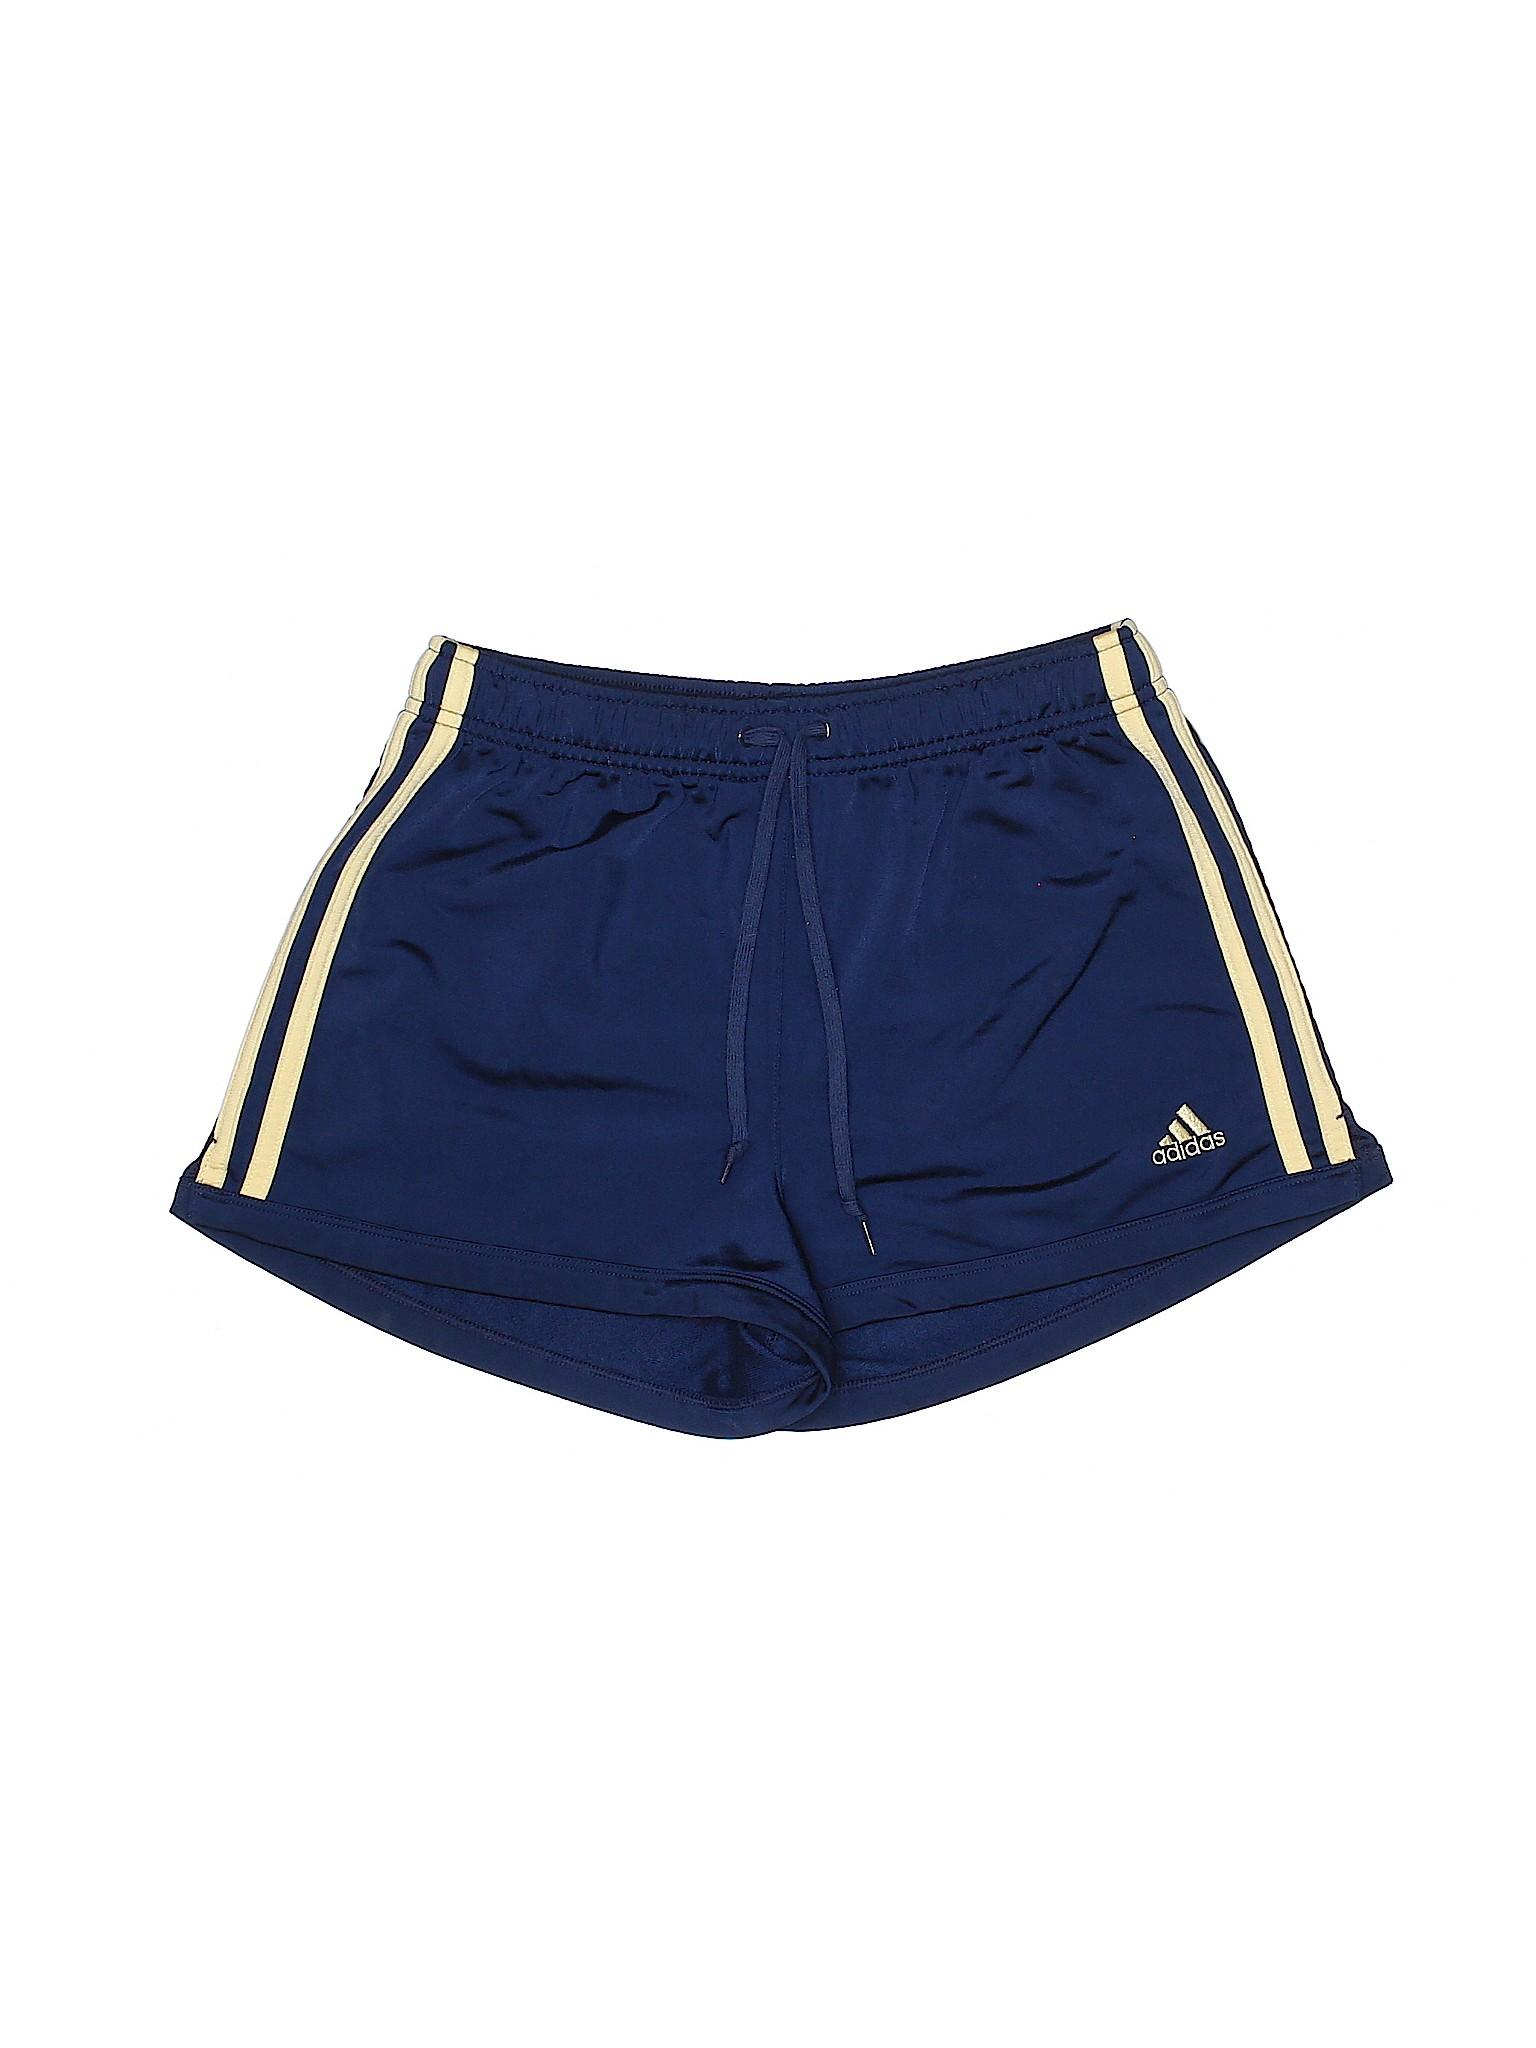 Leisure Leisure Shorts Adidas winter Adidas Athletic Athletic Athletic Leisure Shorts winter winter Adidas UwqA5E